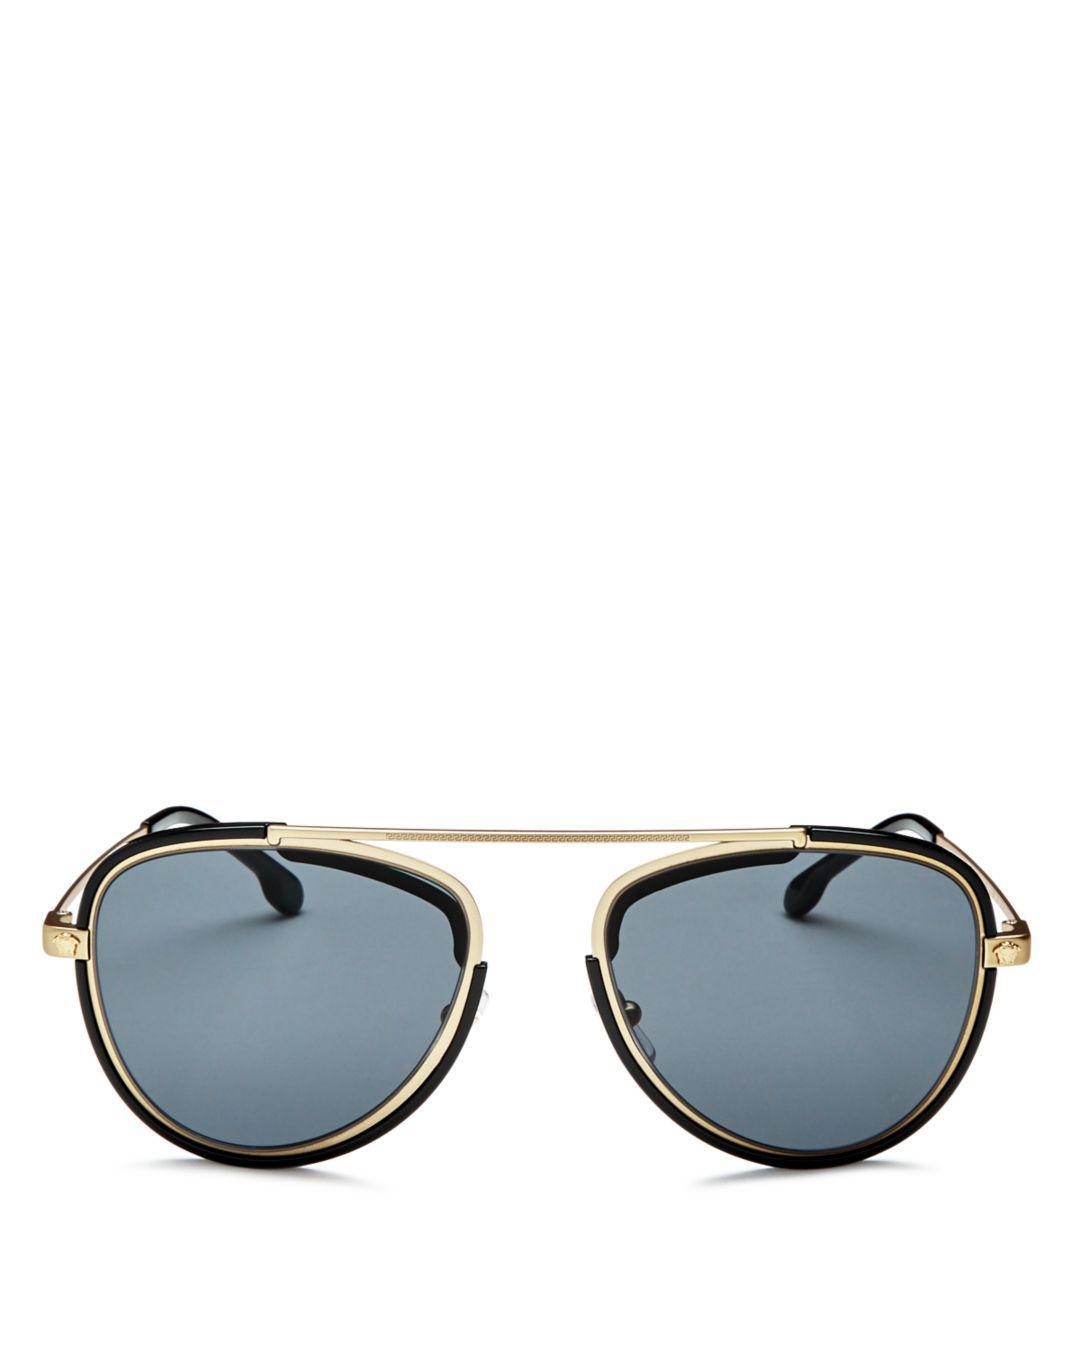 6df1efe54b Versace. Metallic Versace Men s Brow Bar Aviator Sunglasses ...